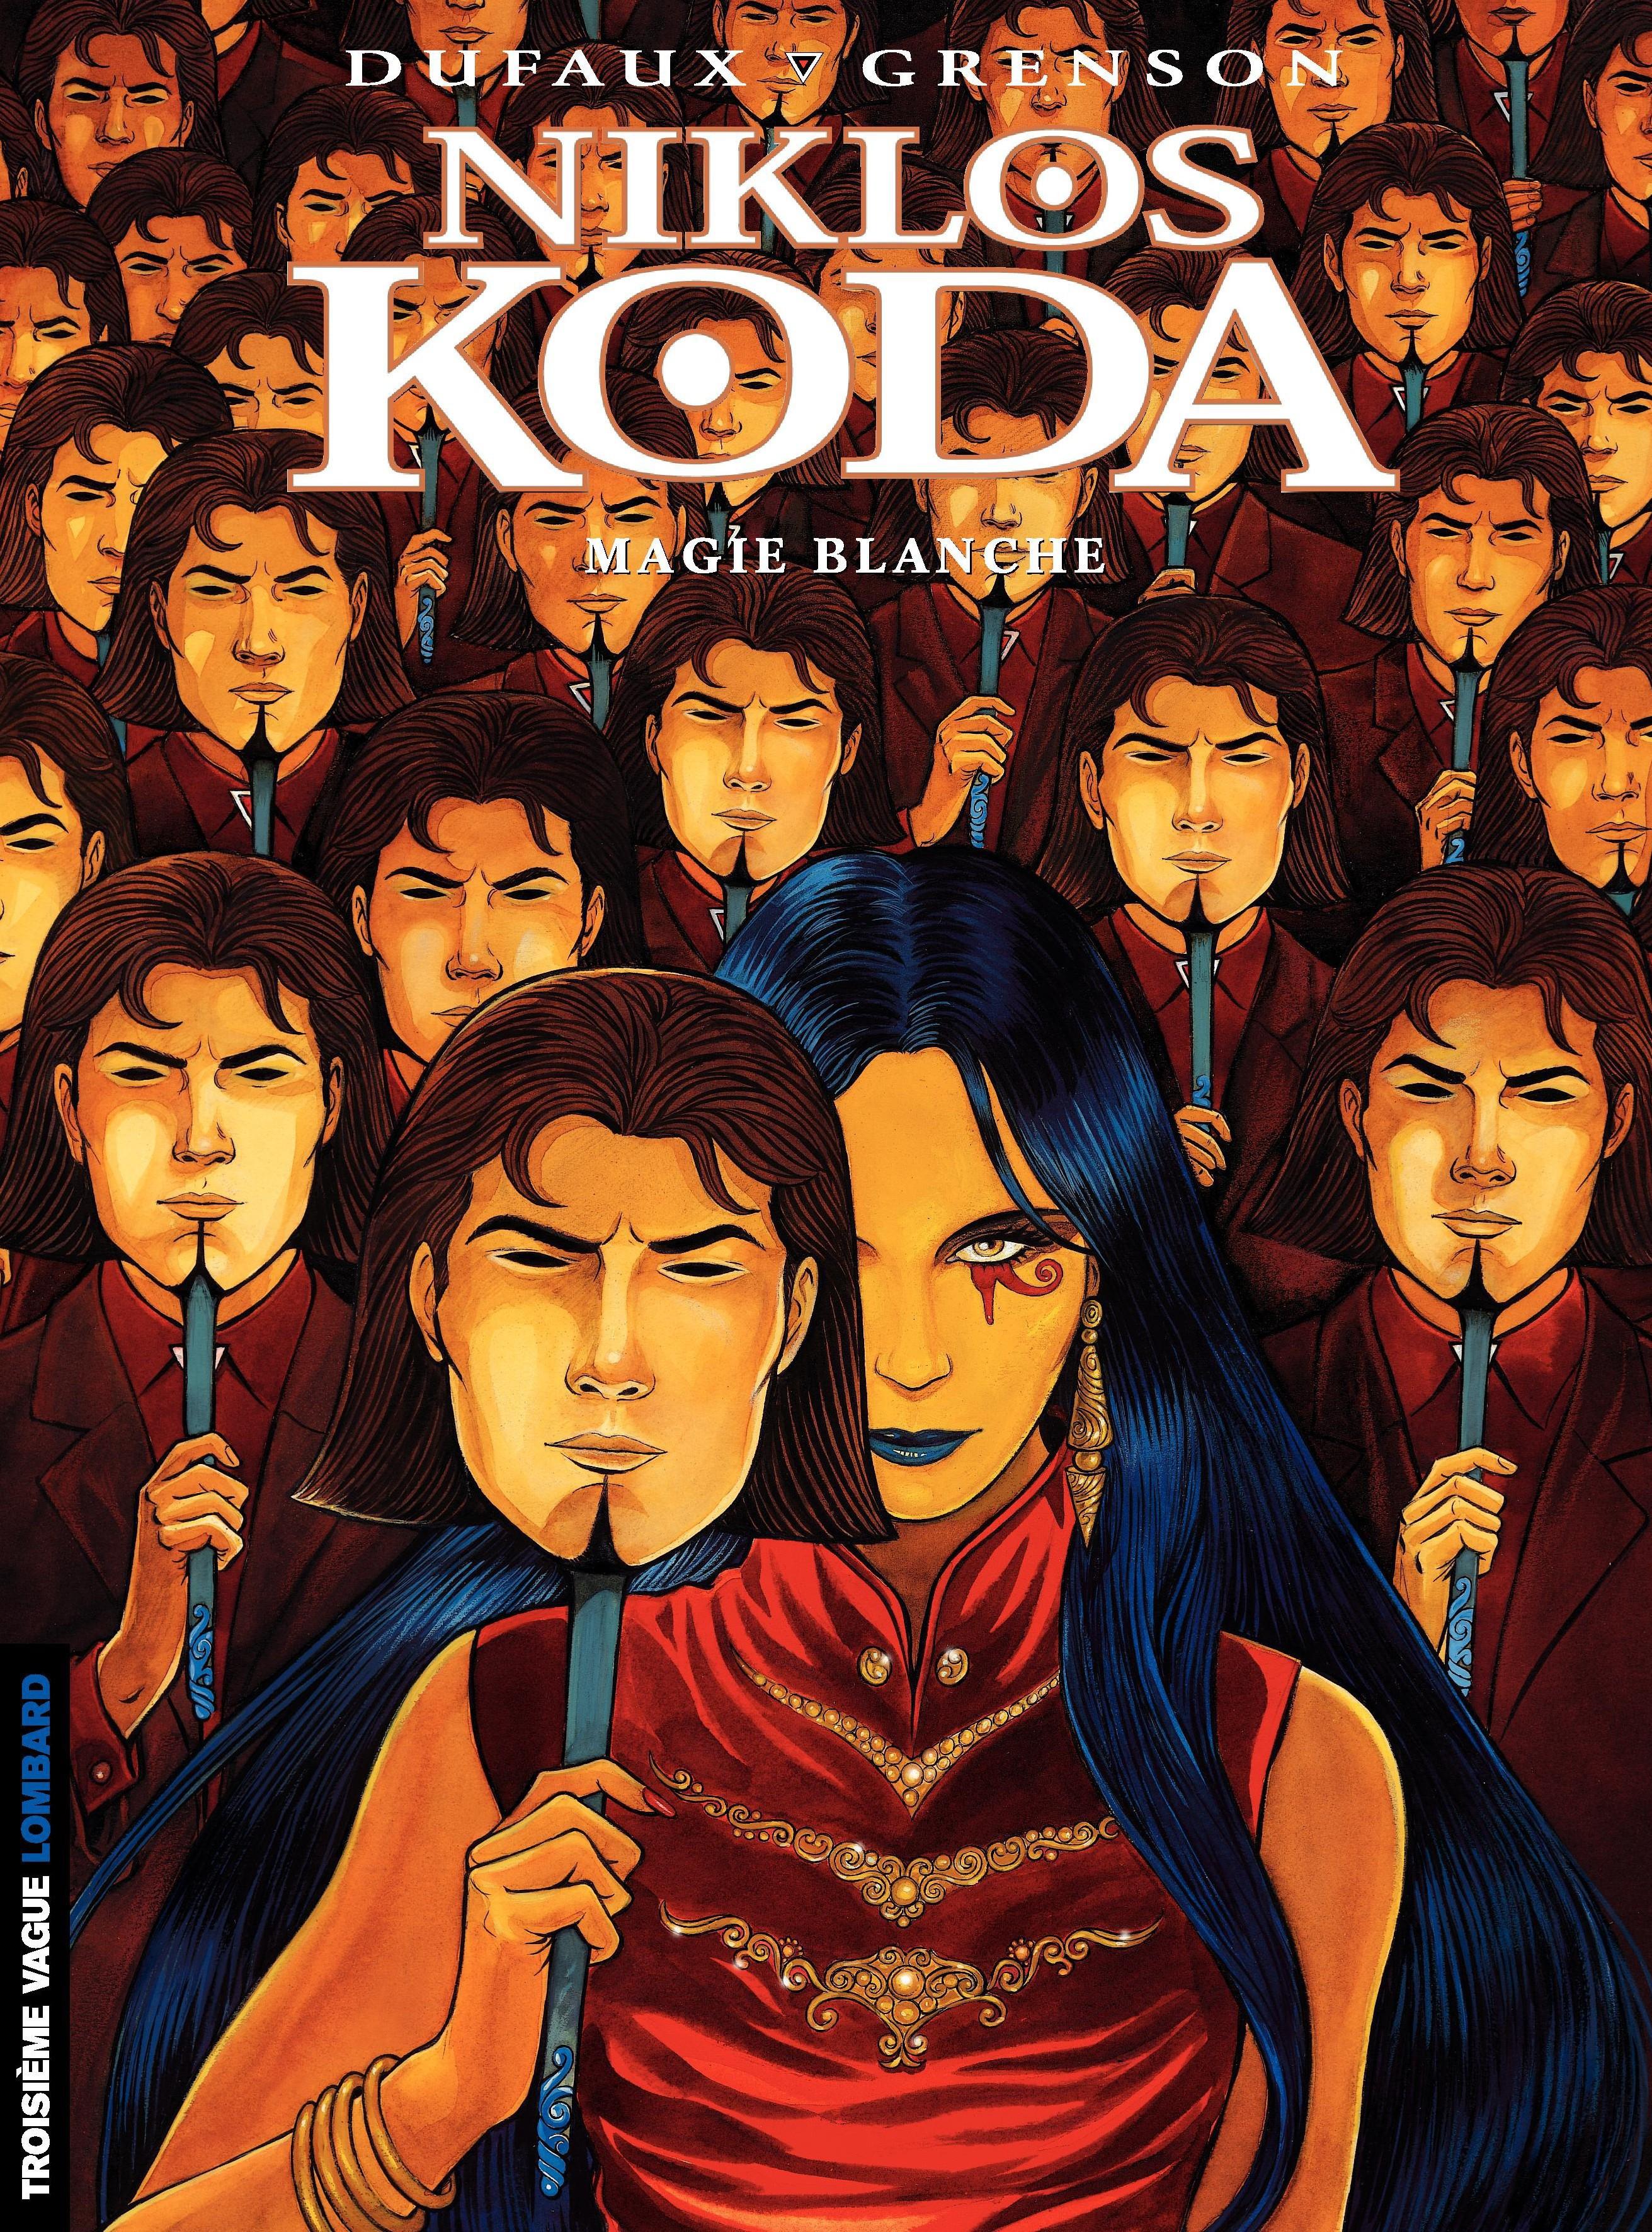 Niklos Koda – tome 7 - Magie blanche